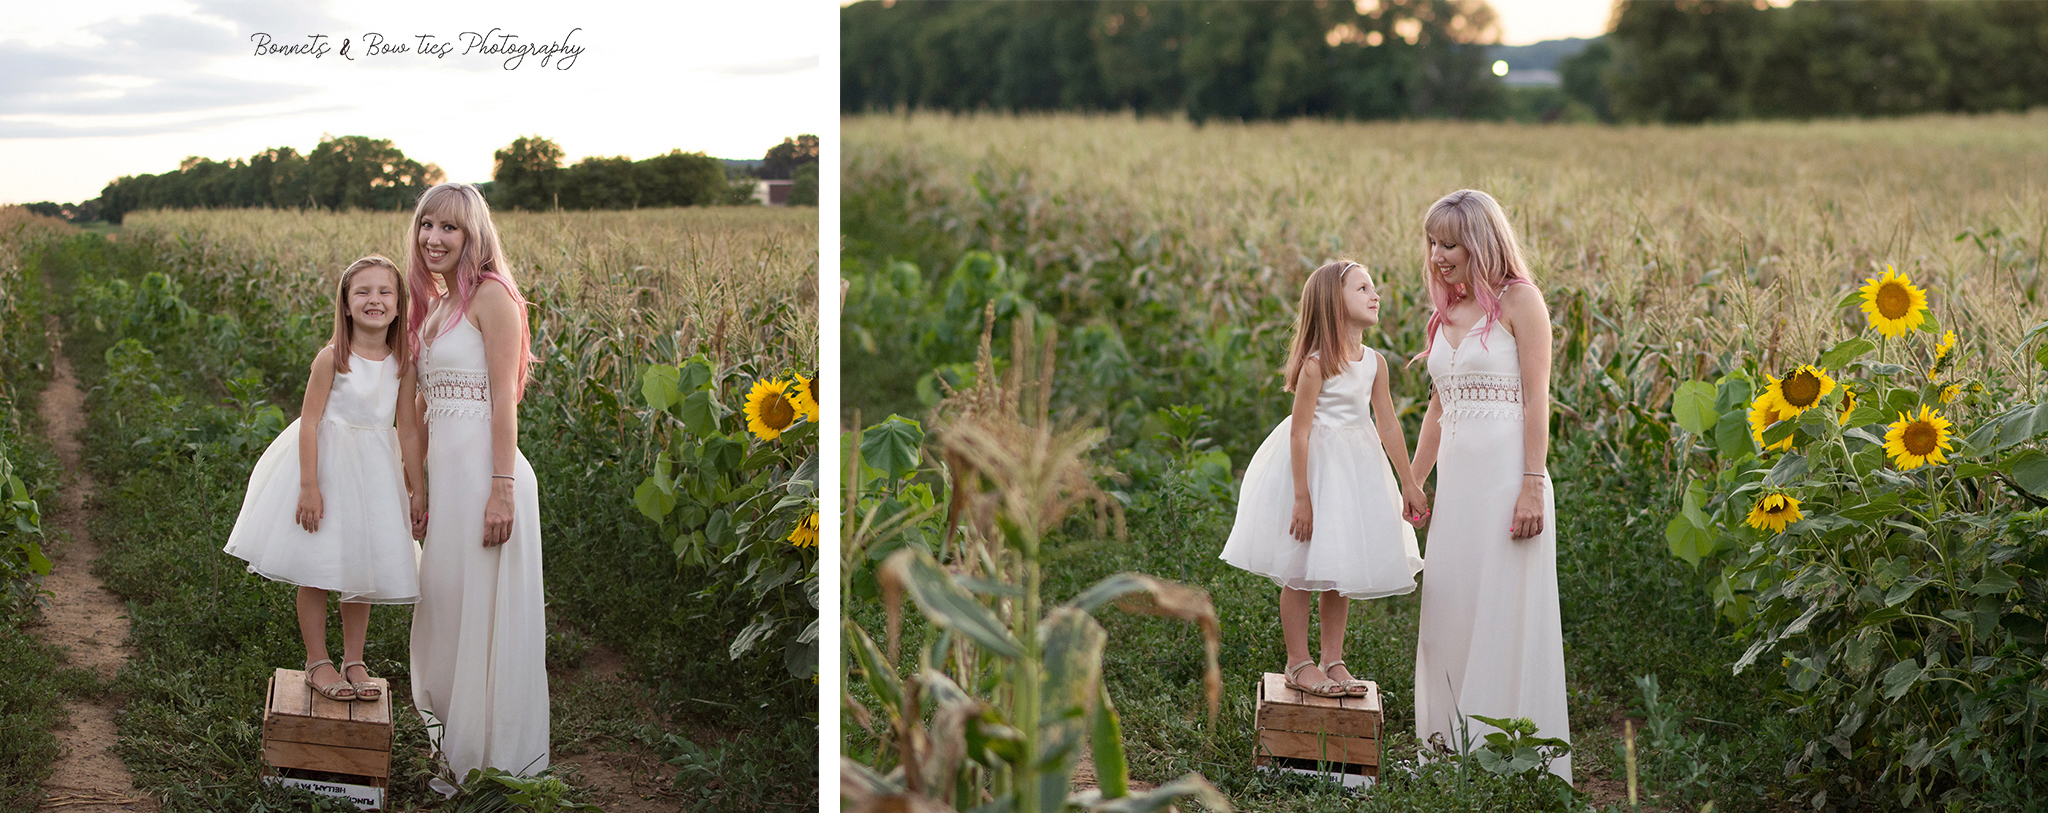 mother- daughter photo shoot york pa white dresses.jpg